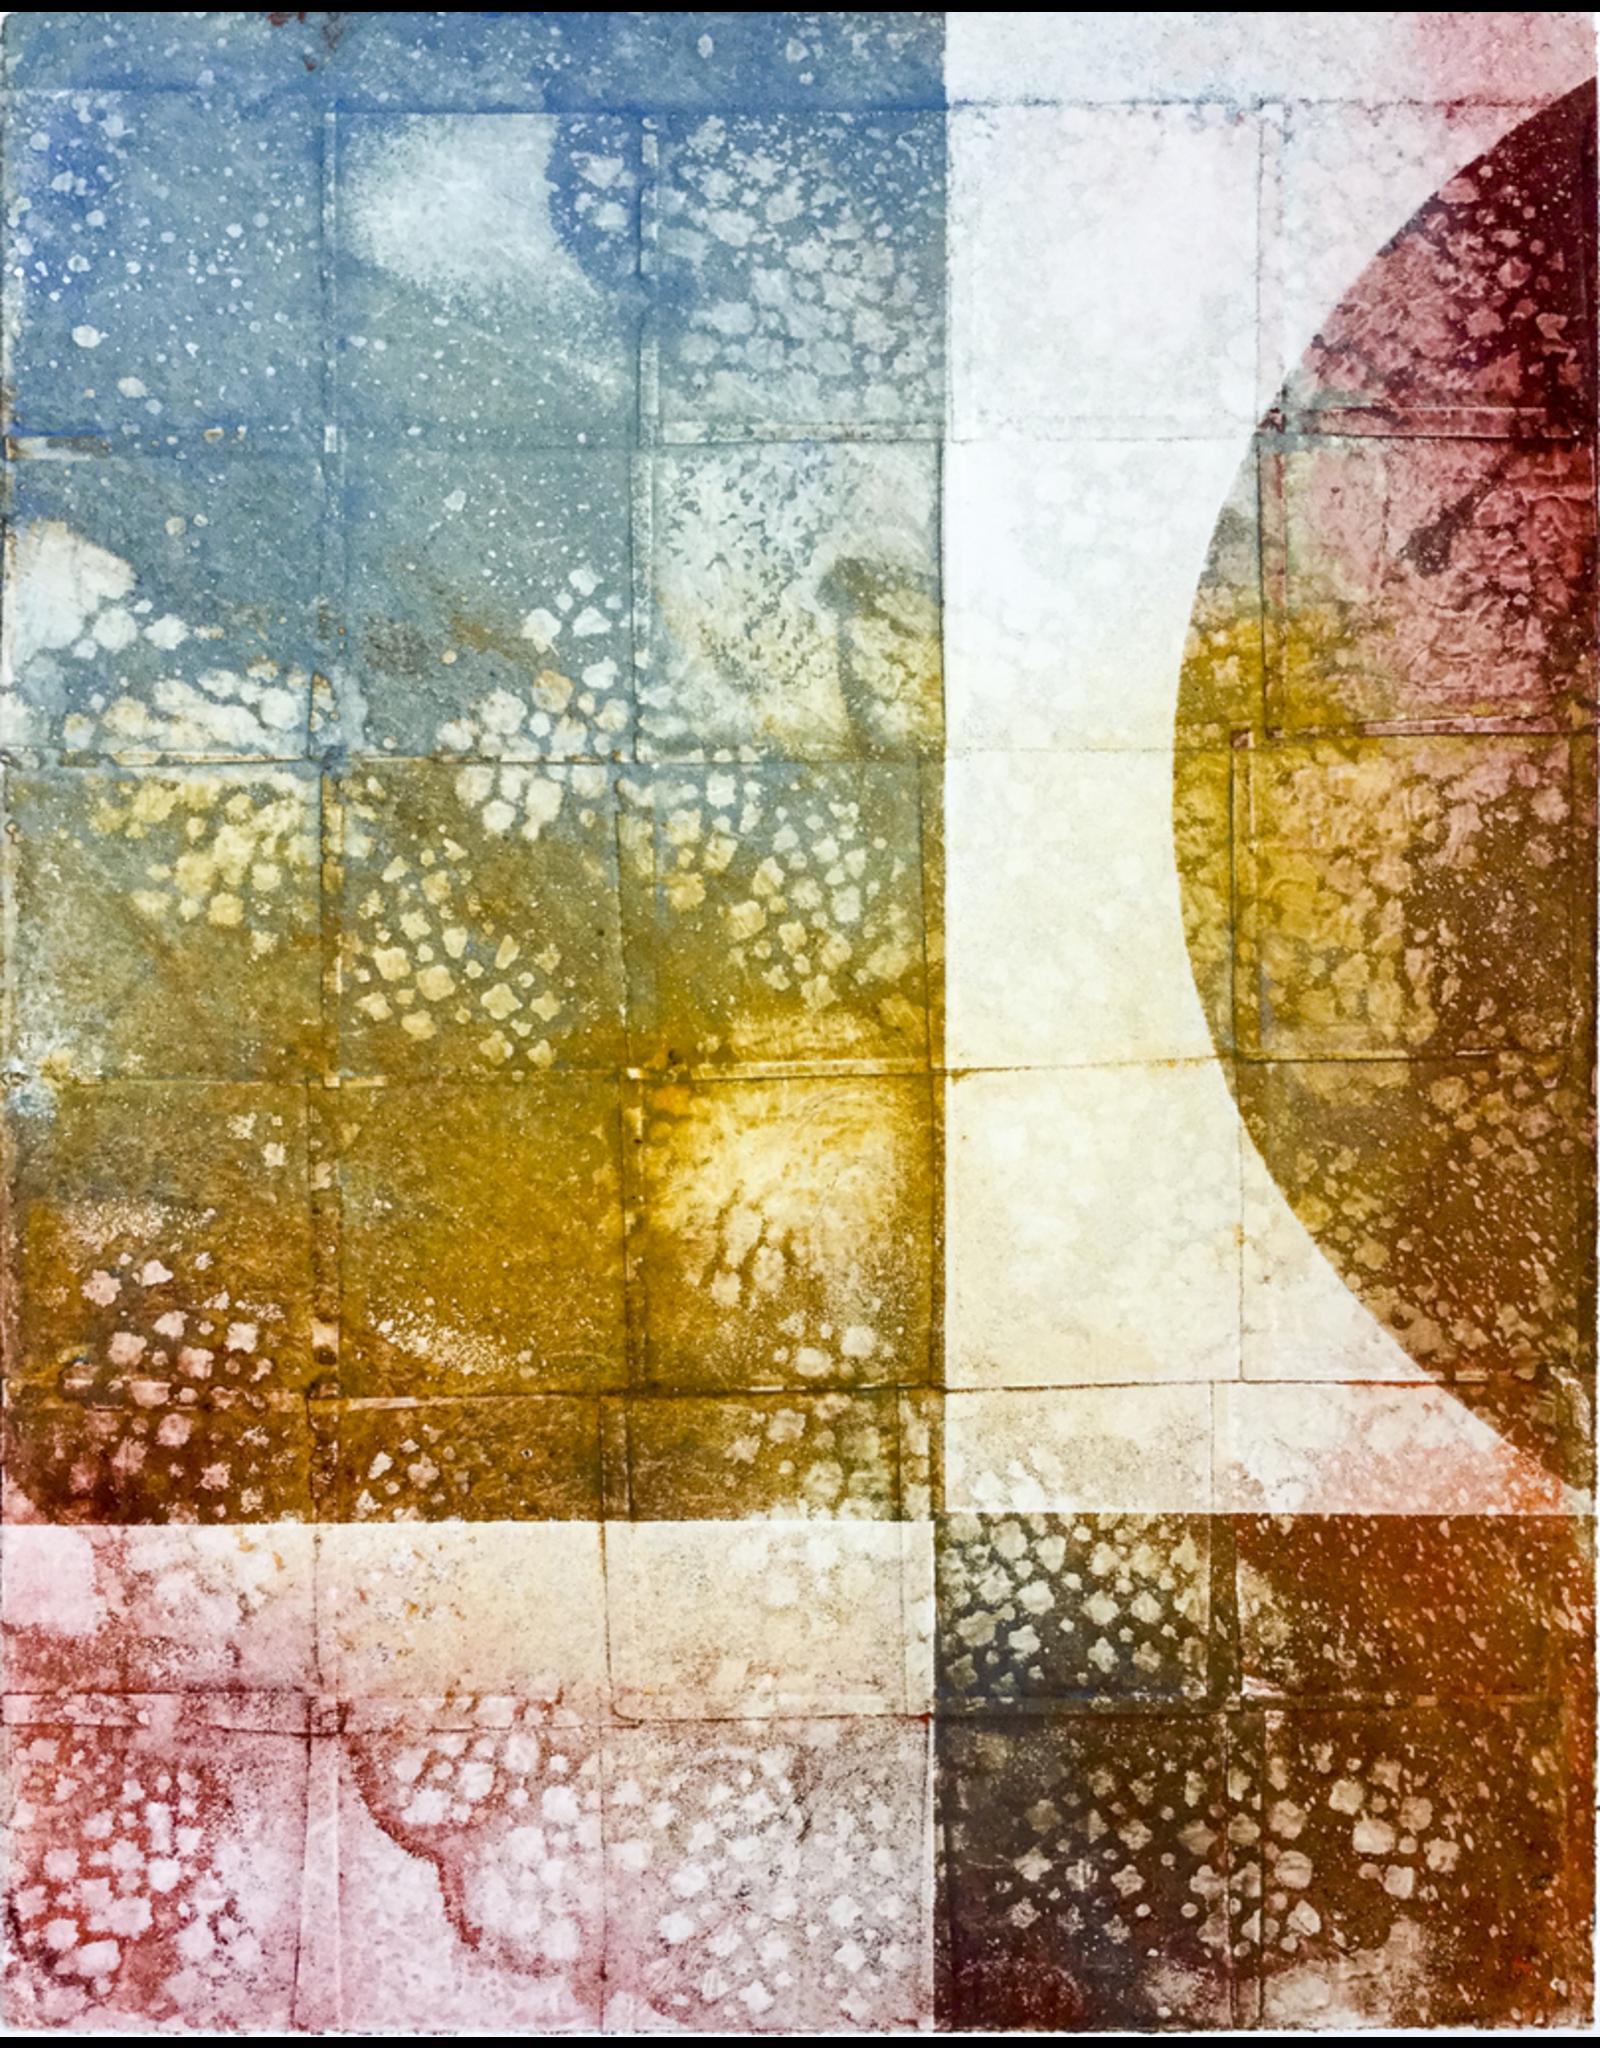 Luvera, Angela Prairie Forms, Angela Luvera